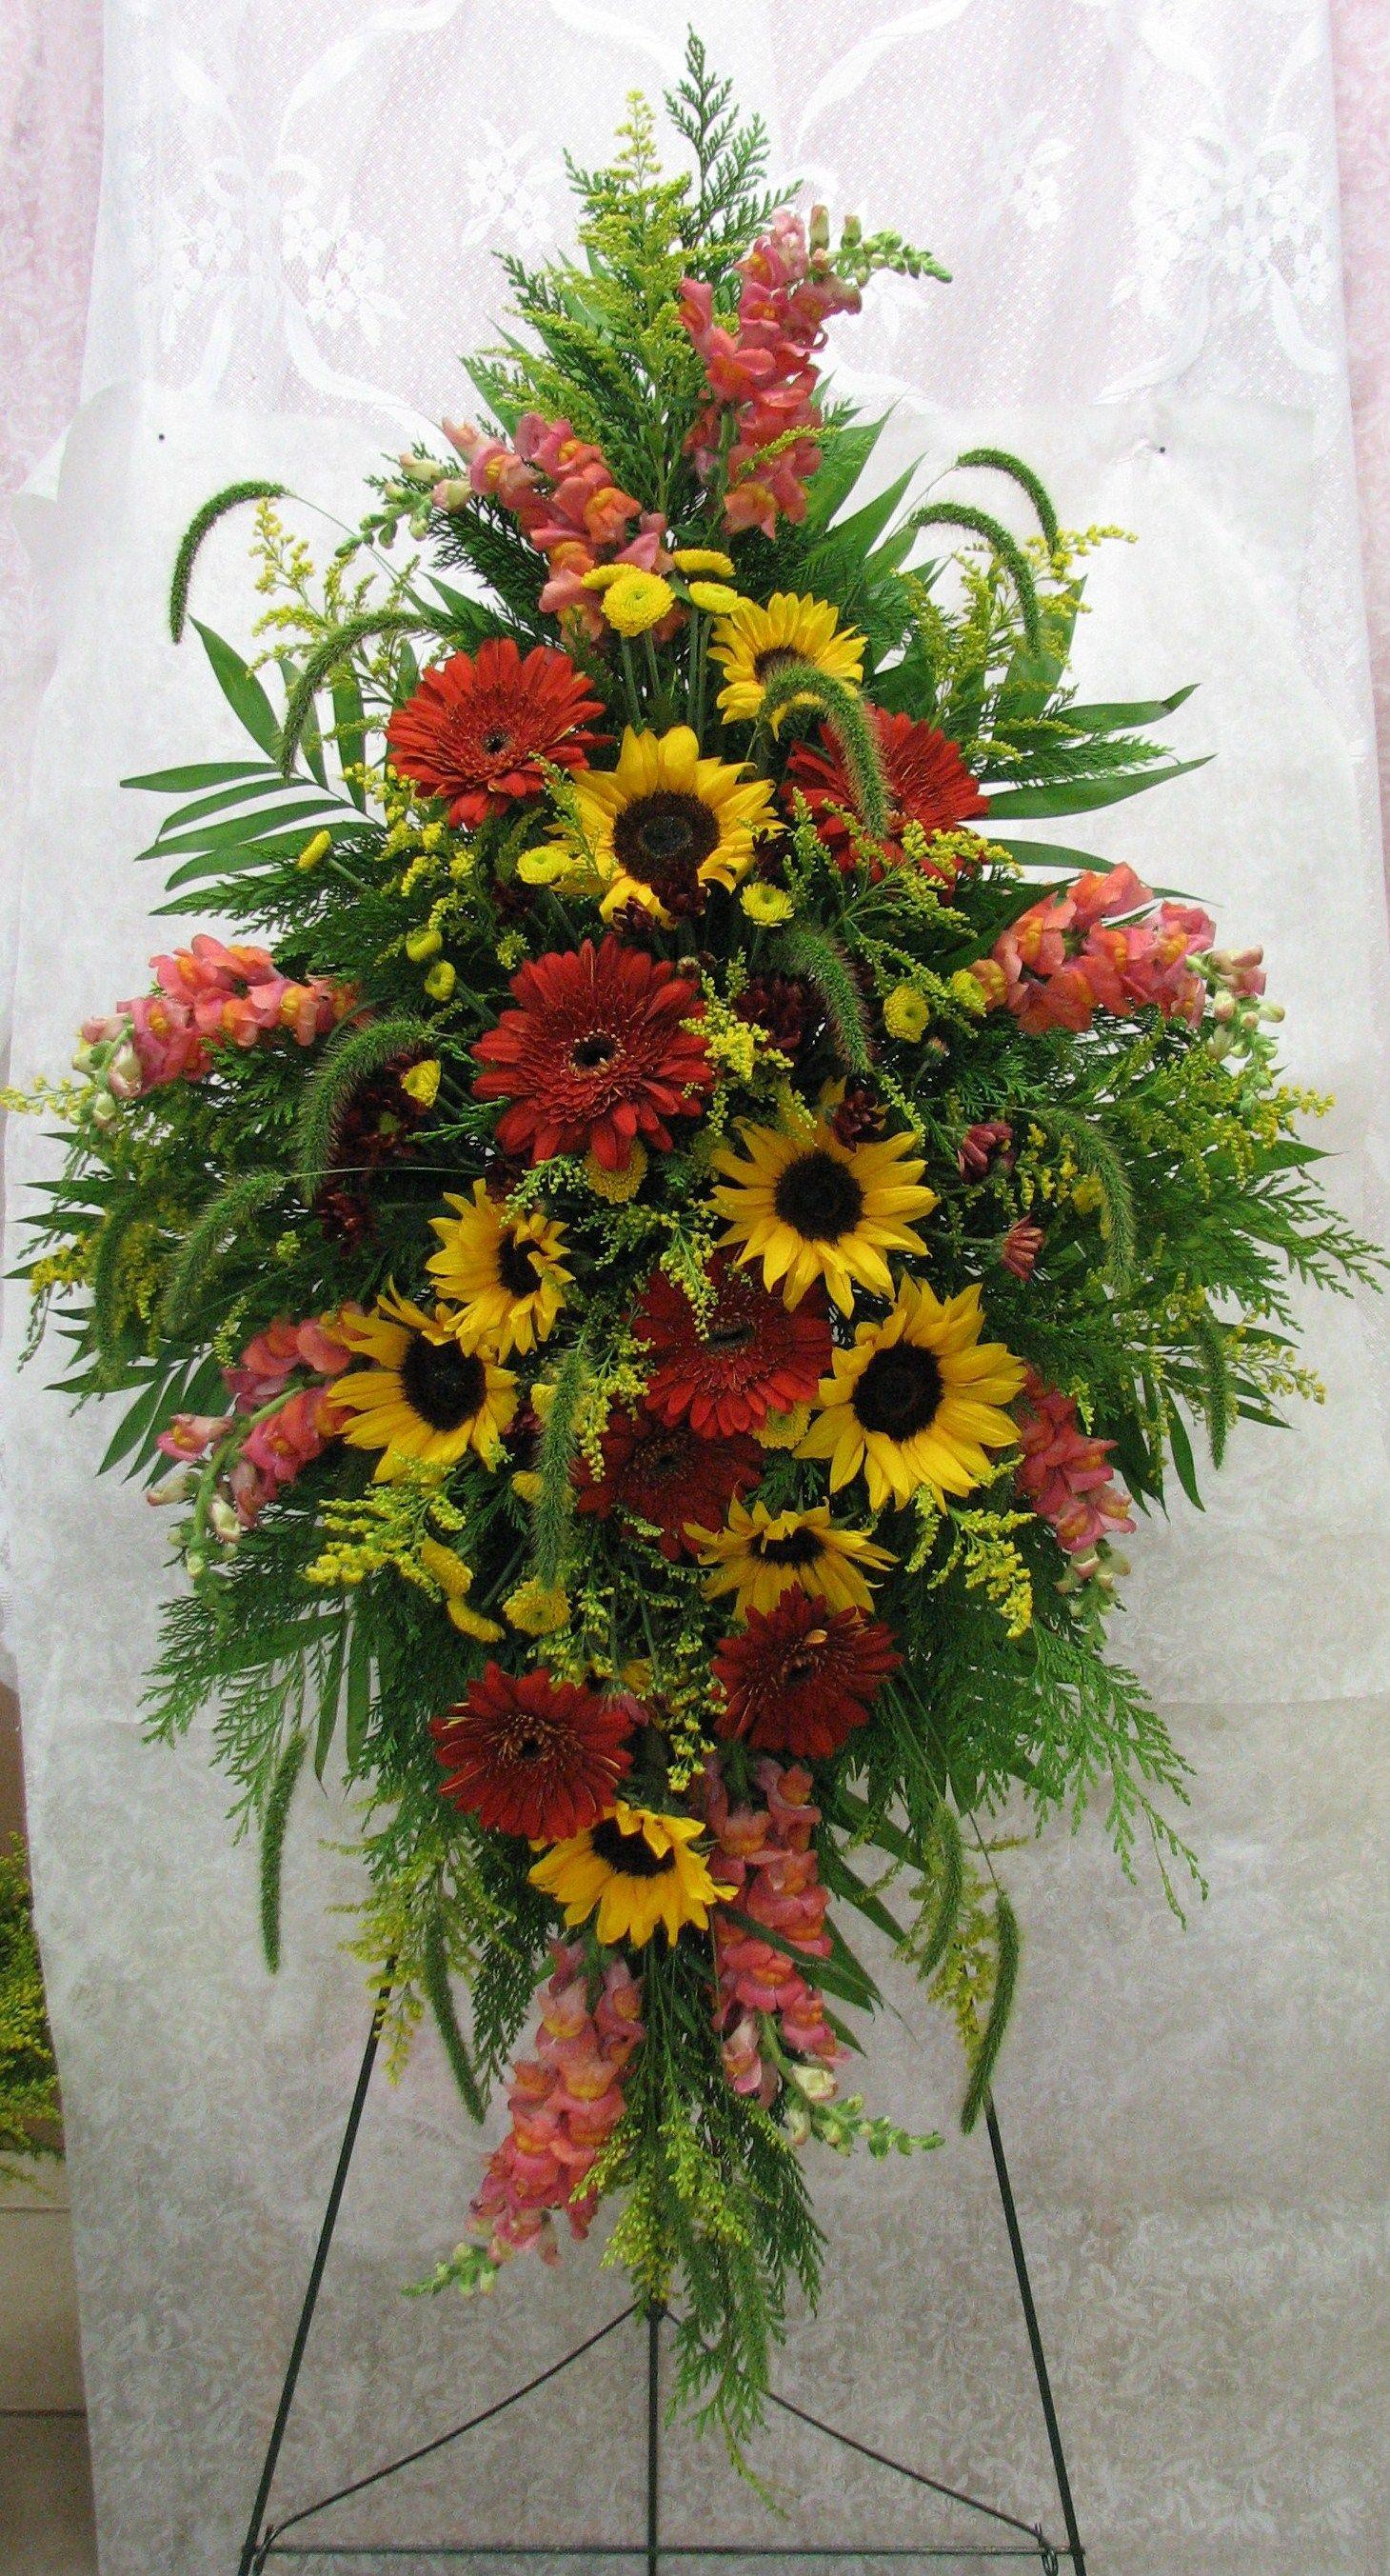 Fall standing spray sympathy flowers pinterest funeral flowers fall standing spray casket flowers funeral flowers funeral floral arrangements large flower arrangements izmirmasajfo